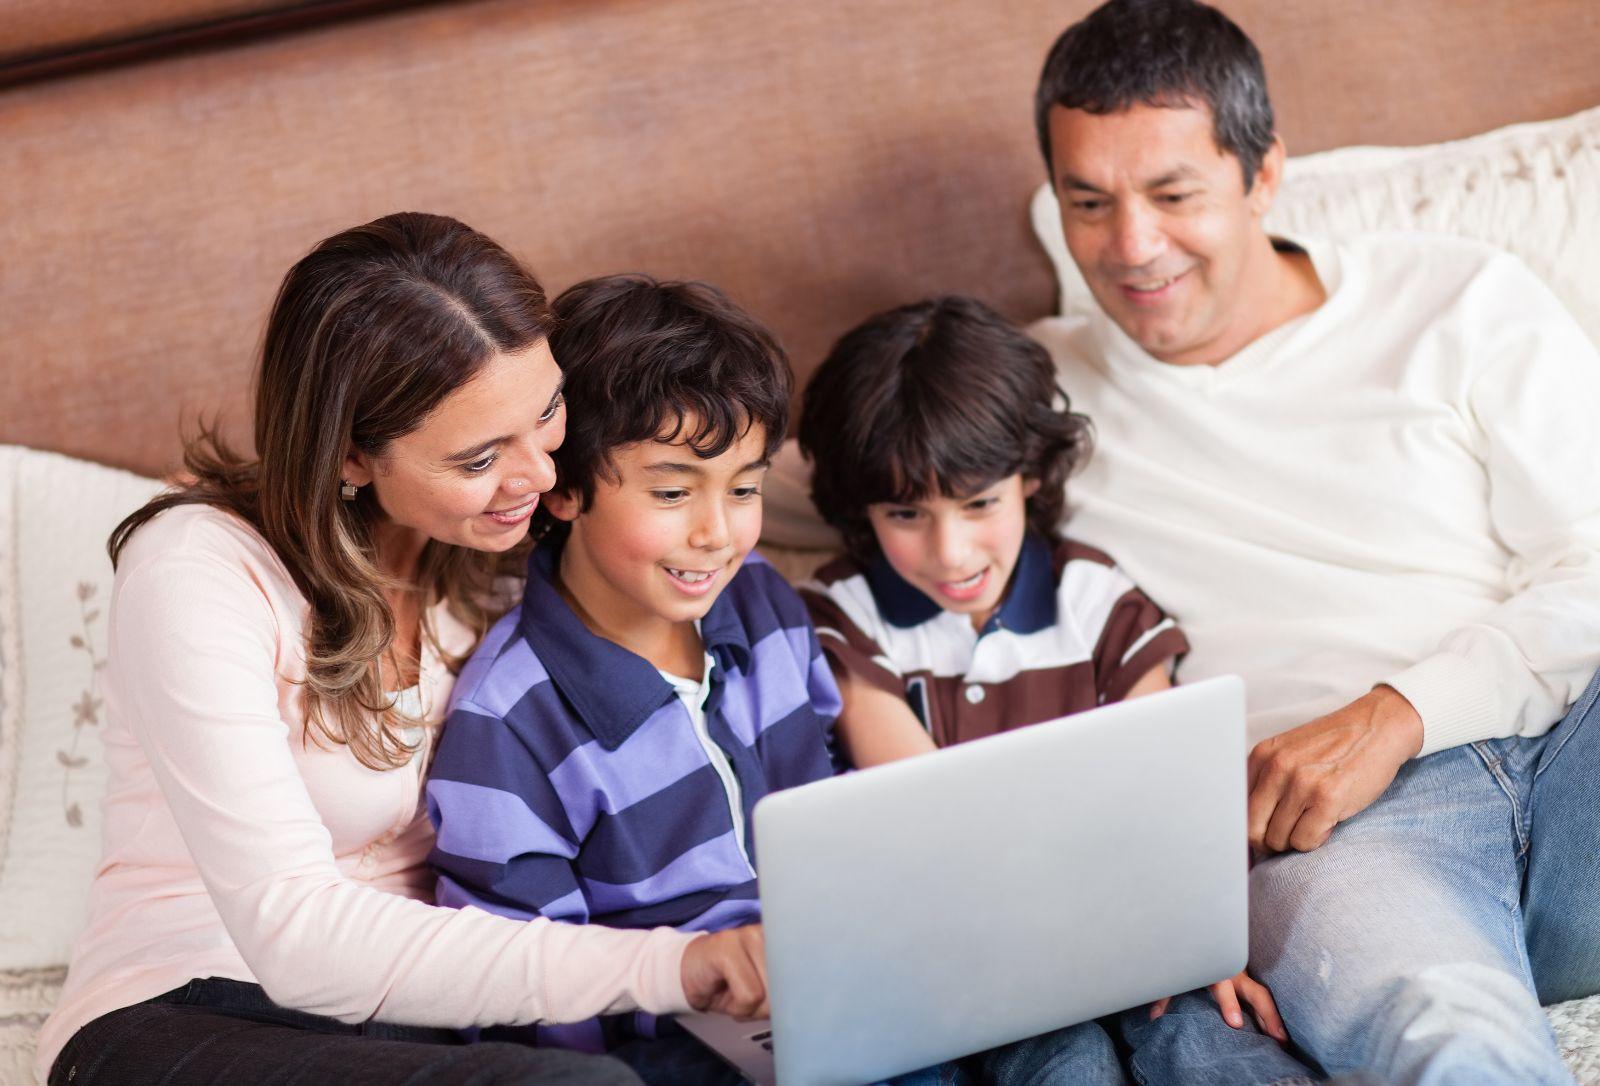 Familia usando una computadora